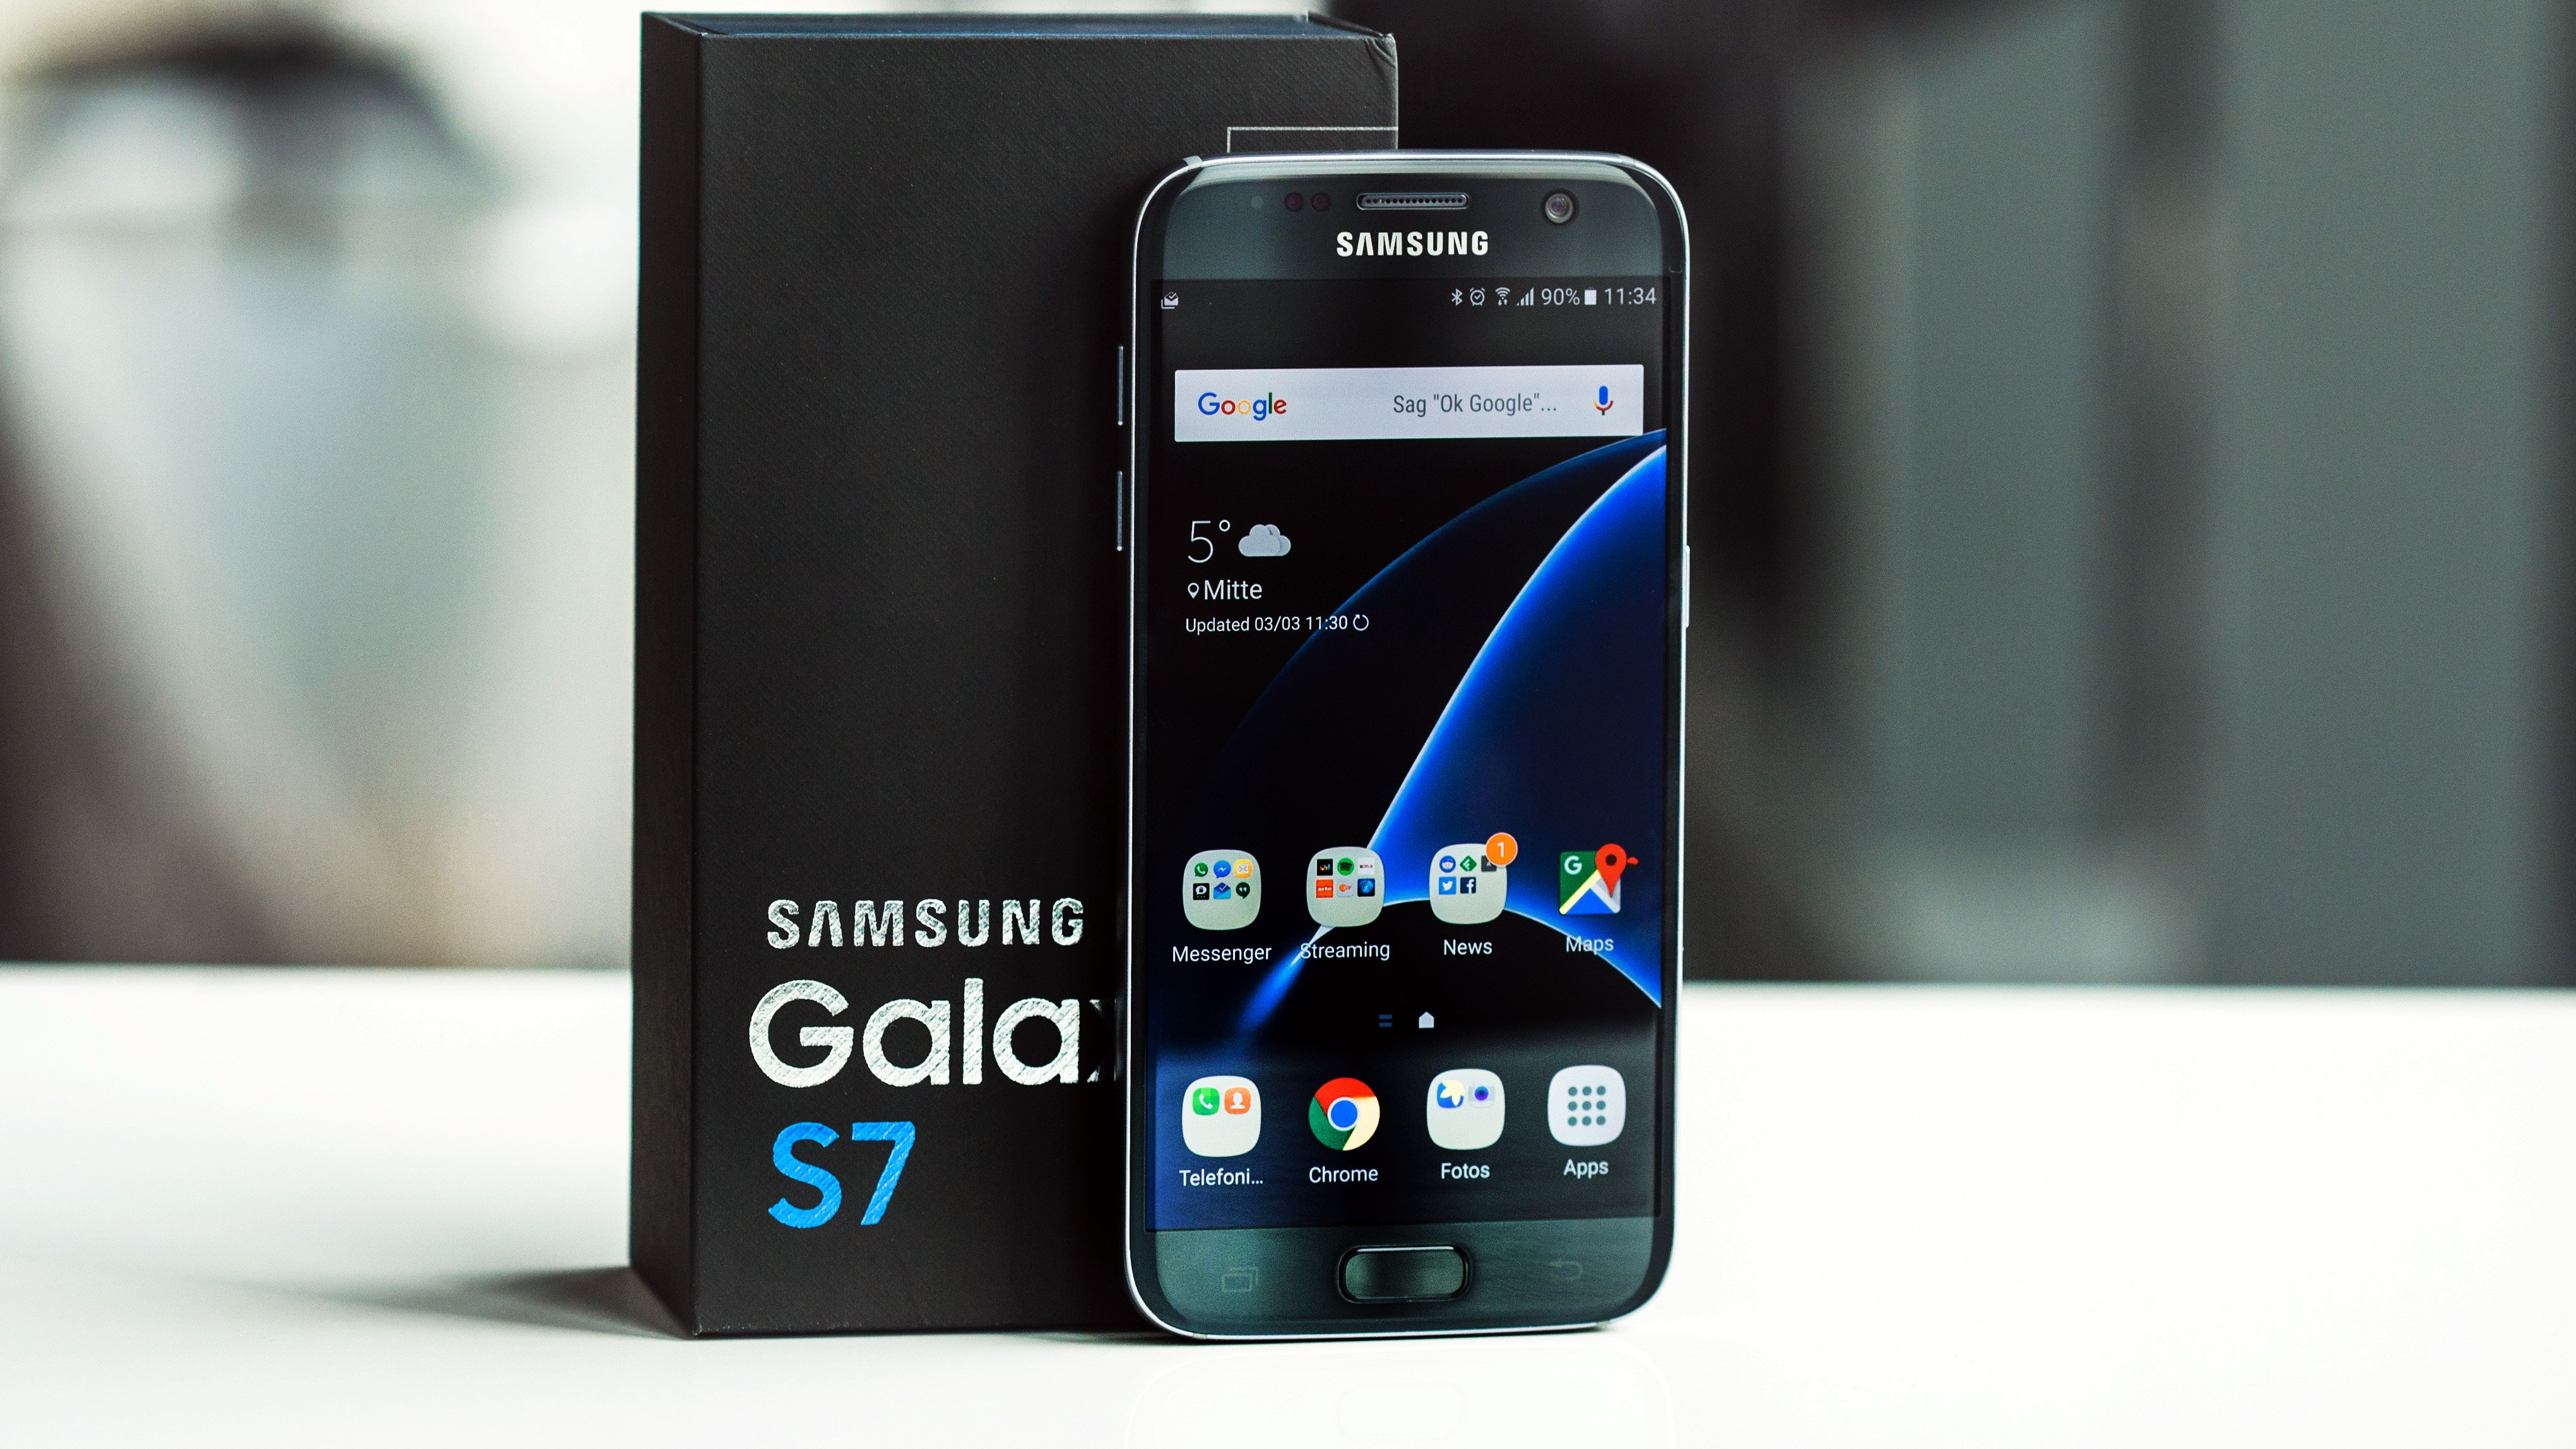 galaxy S7 monde T2 2017